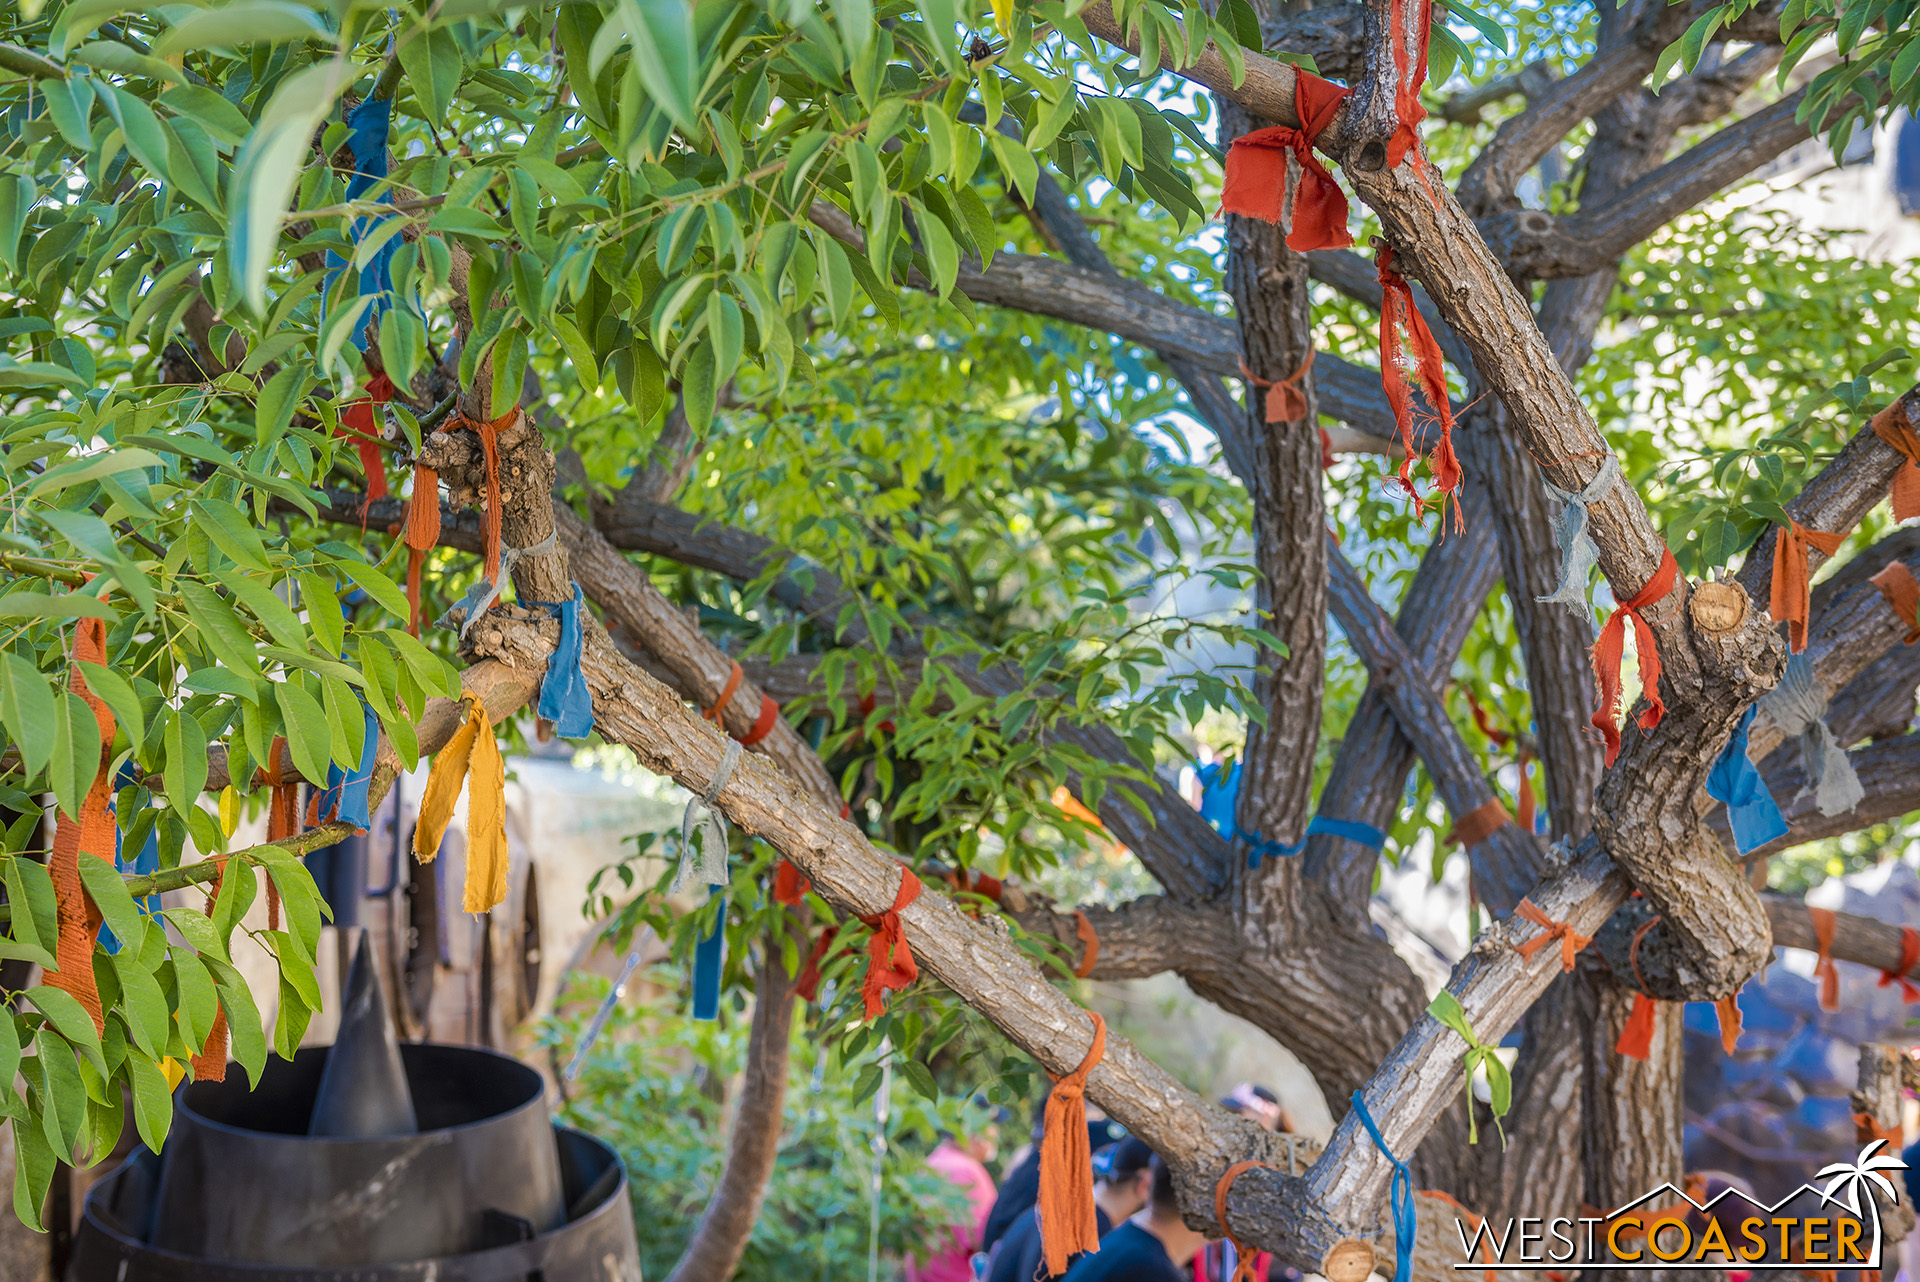 The Wishing Tree outside Savi's.